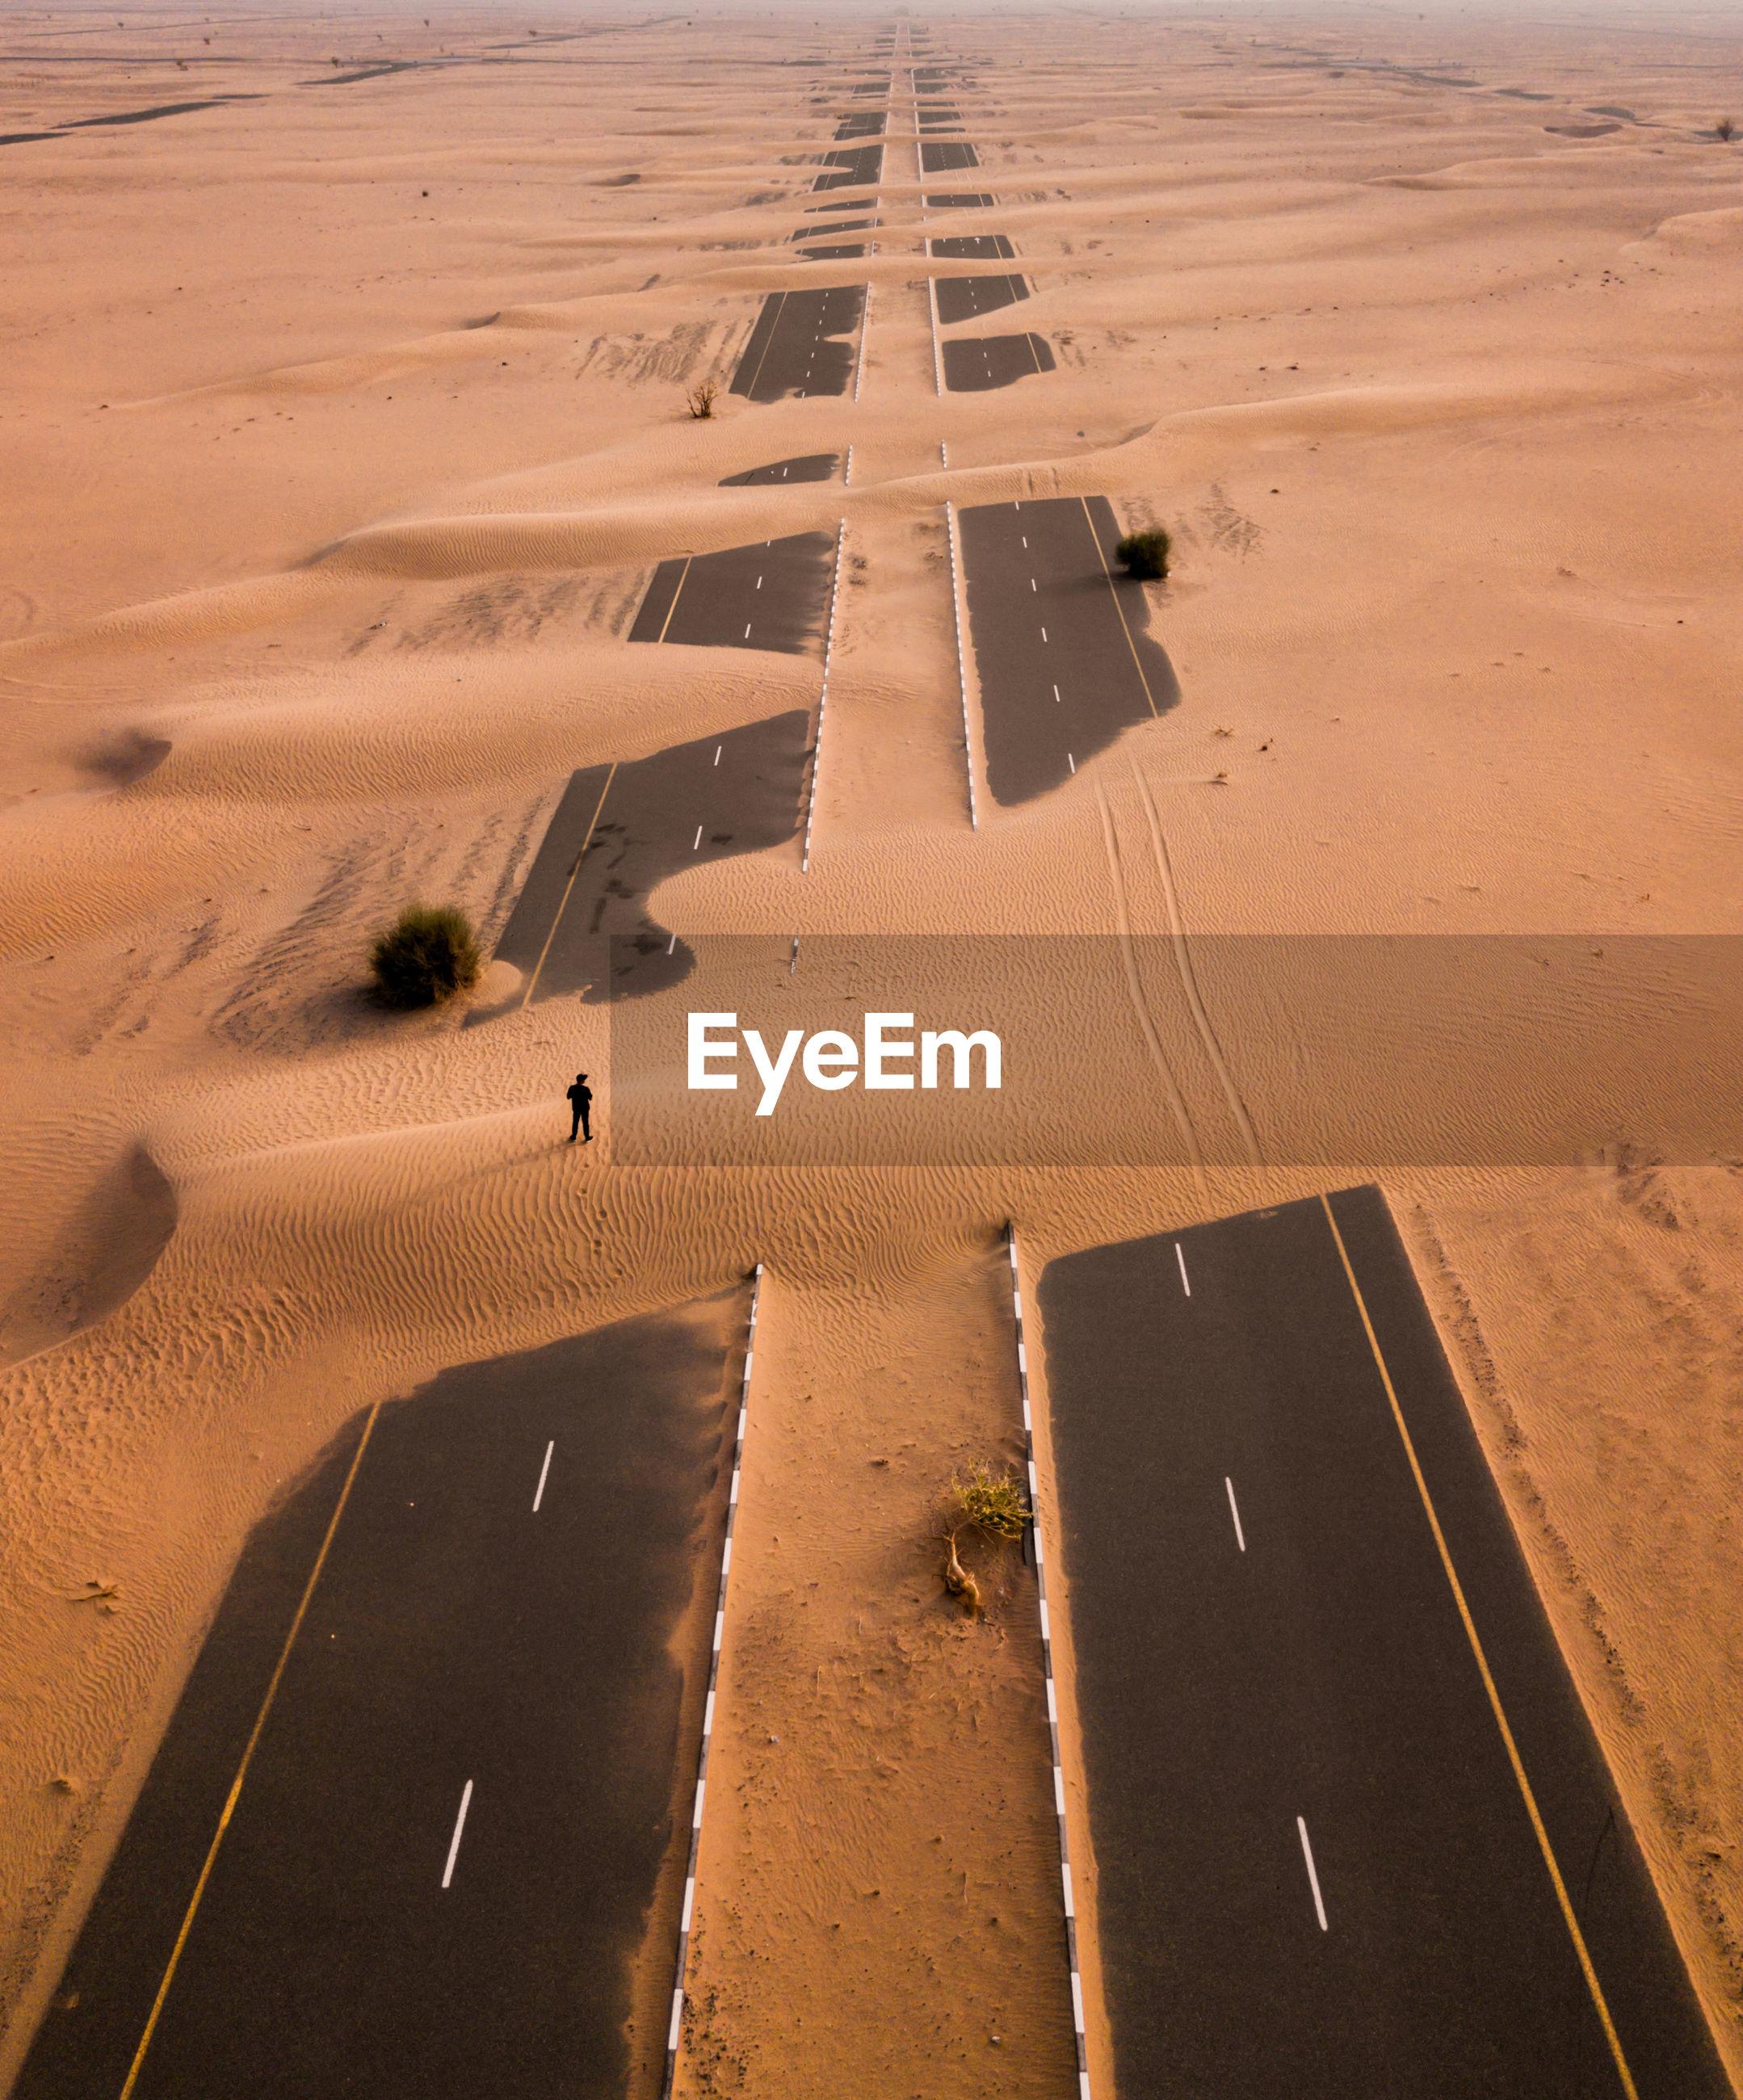 High angle view of man standing on desert